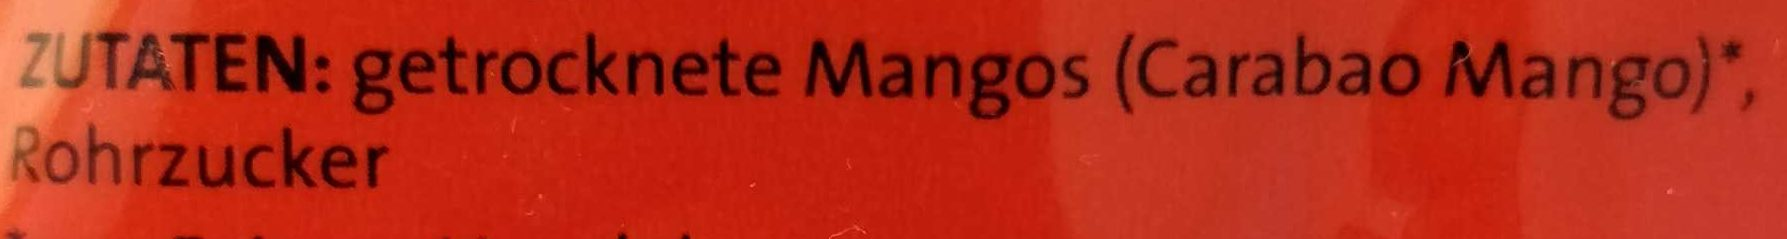 Mango getrocknet in Streifen - Zutaten